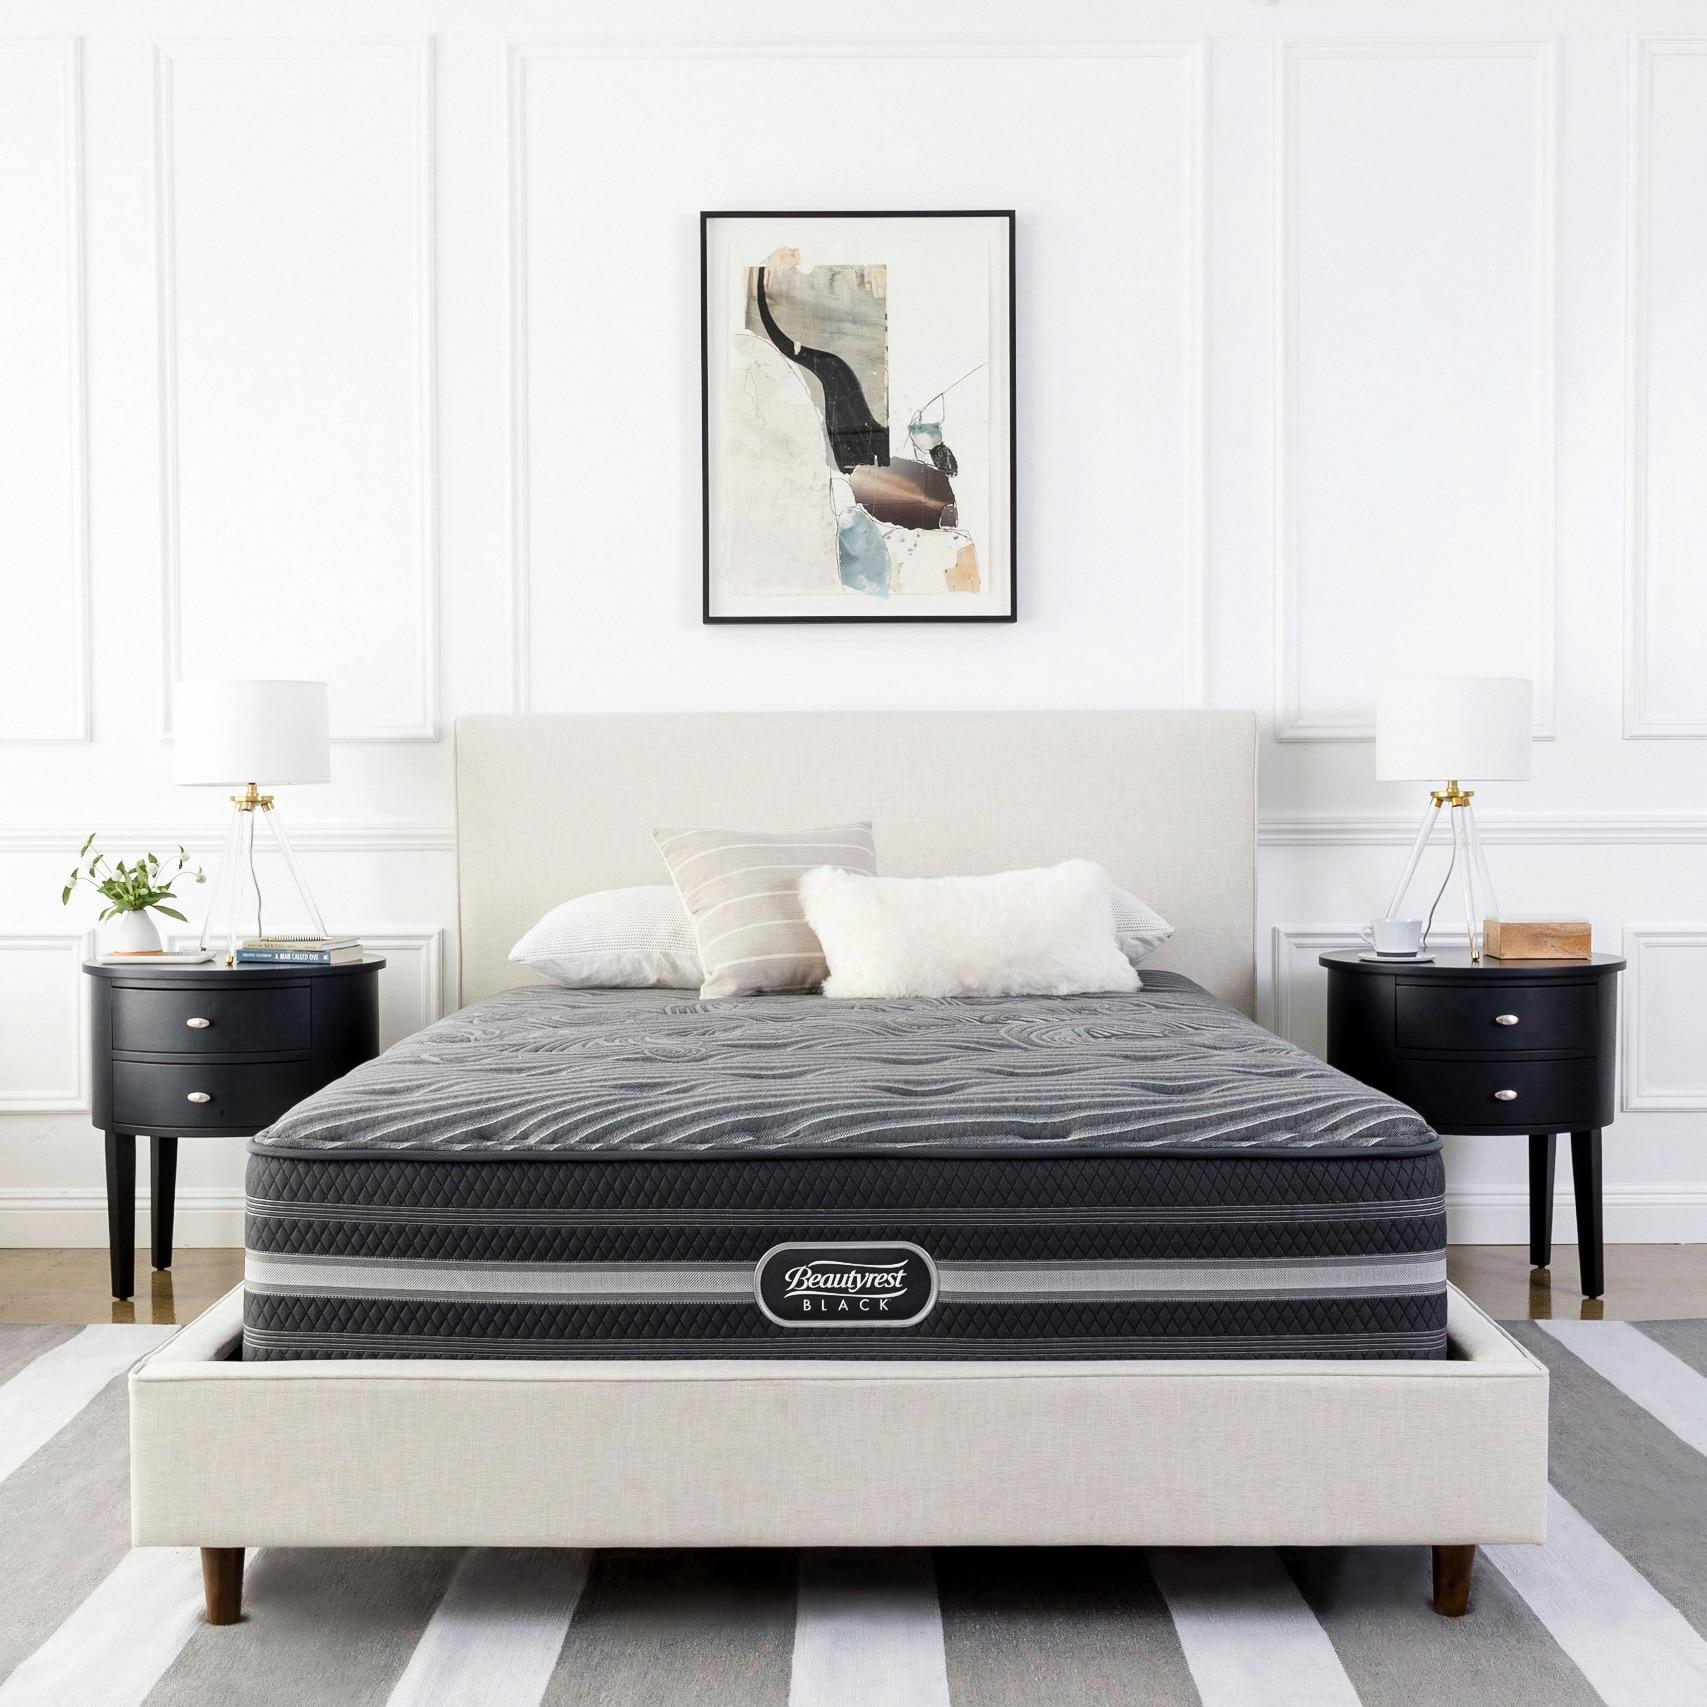 Beautyrest Black Mariela 15-inch Plush California King-si...